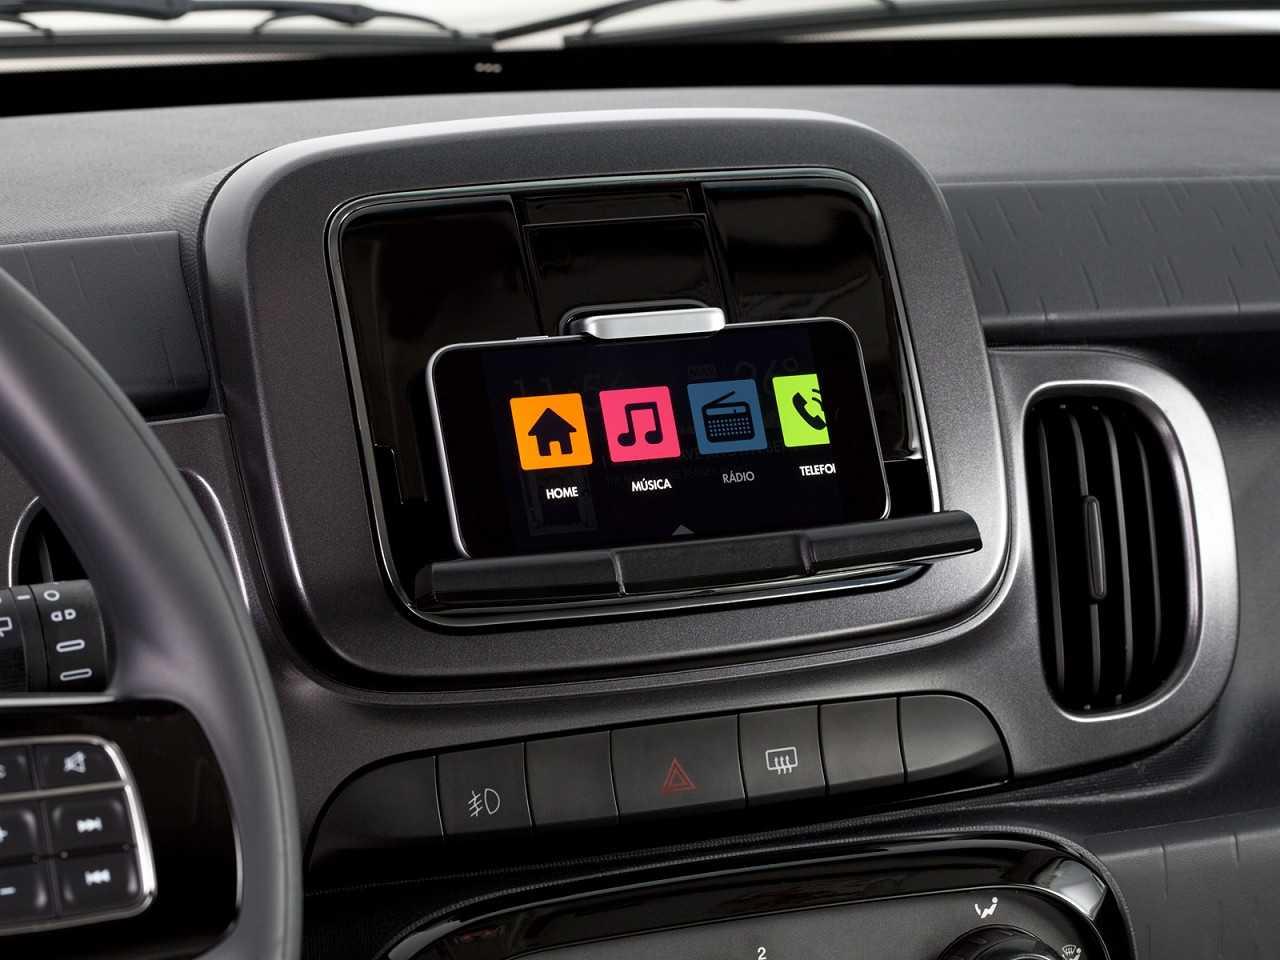 FiatMobi 2017 - console central